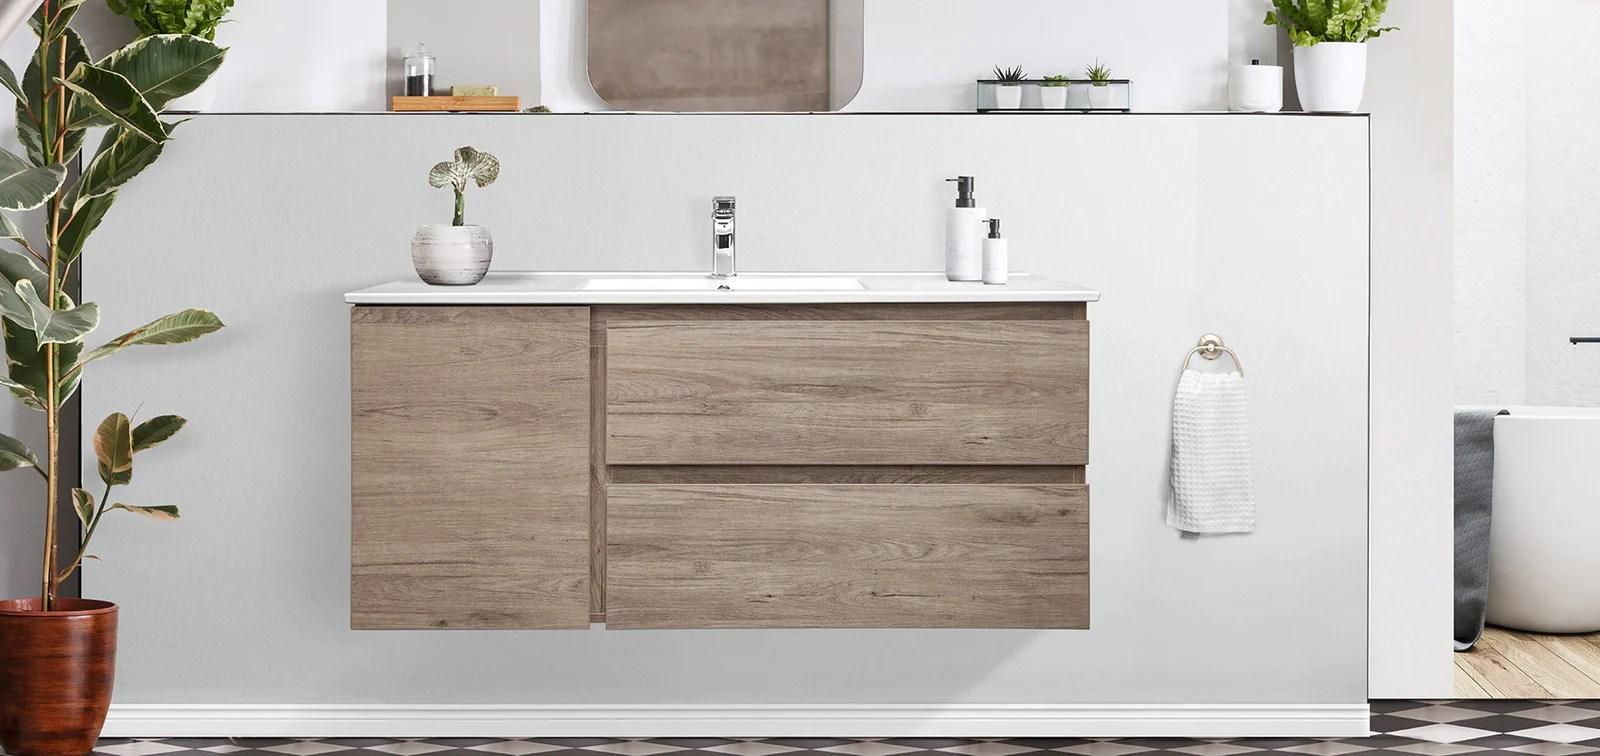 Bathroom Supplies Melbourne Arova Kitchens Bathrooms